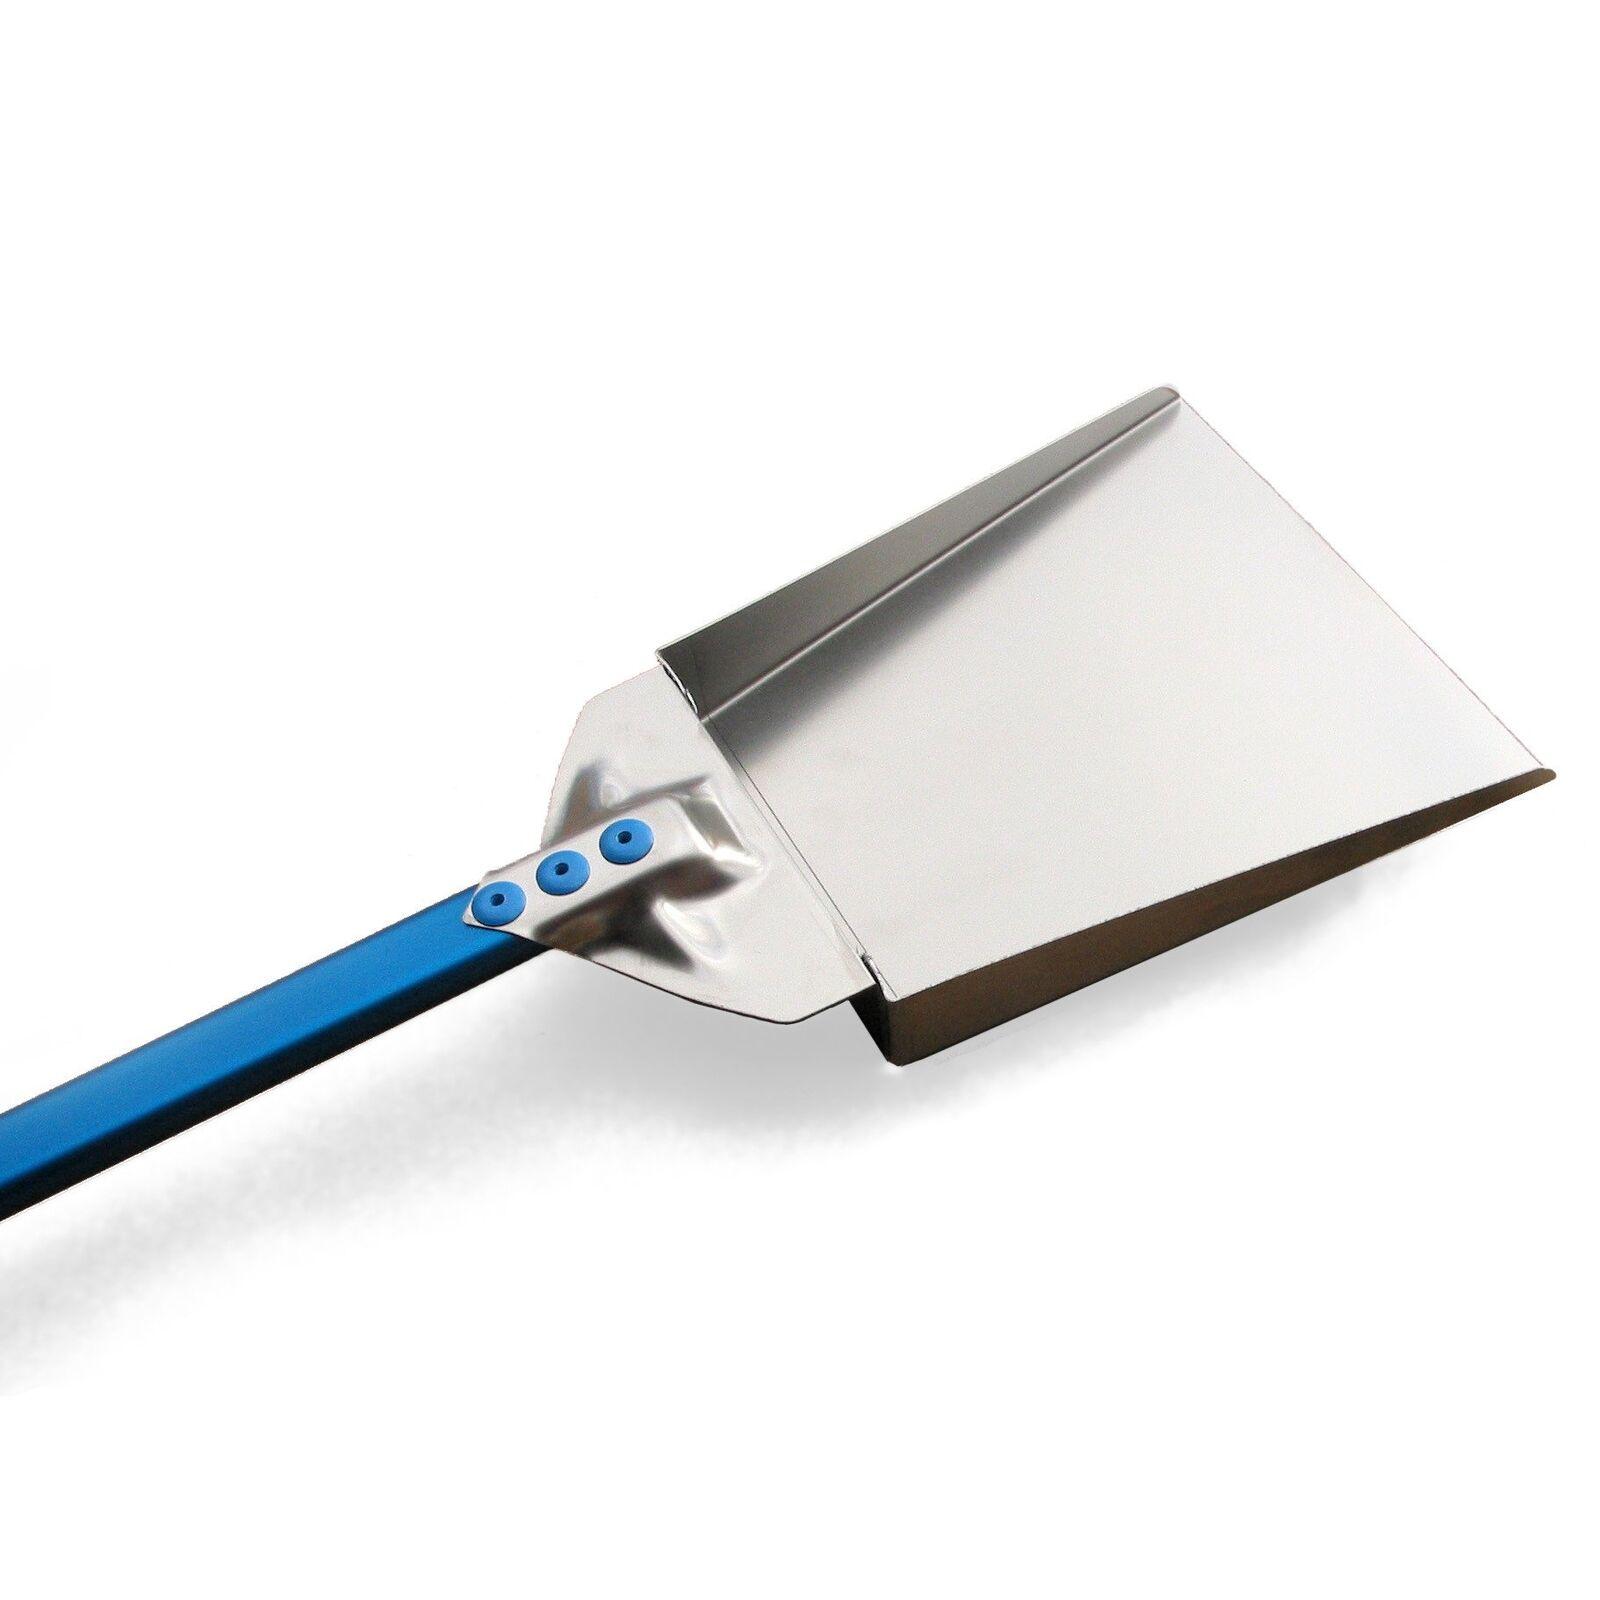 GI.METAL Ash Shovel for Wood-Firouge Pizza Oven -  Stainless - 47  Aluminum Handle